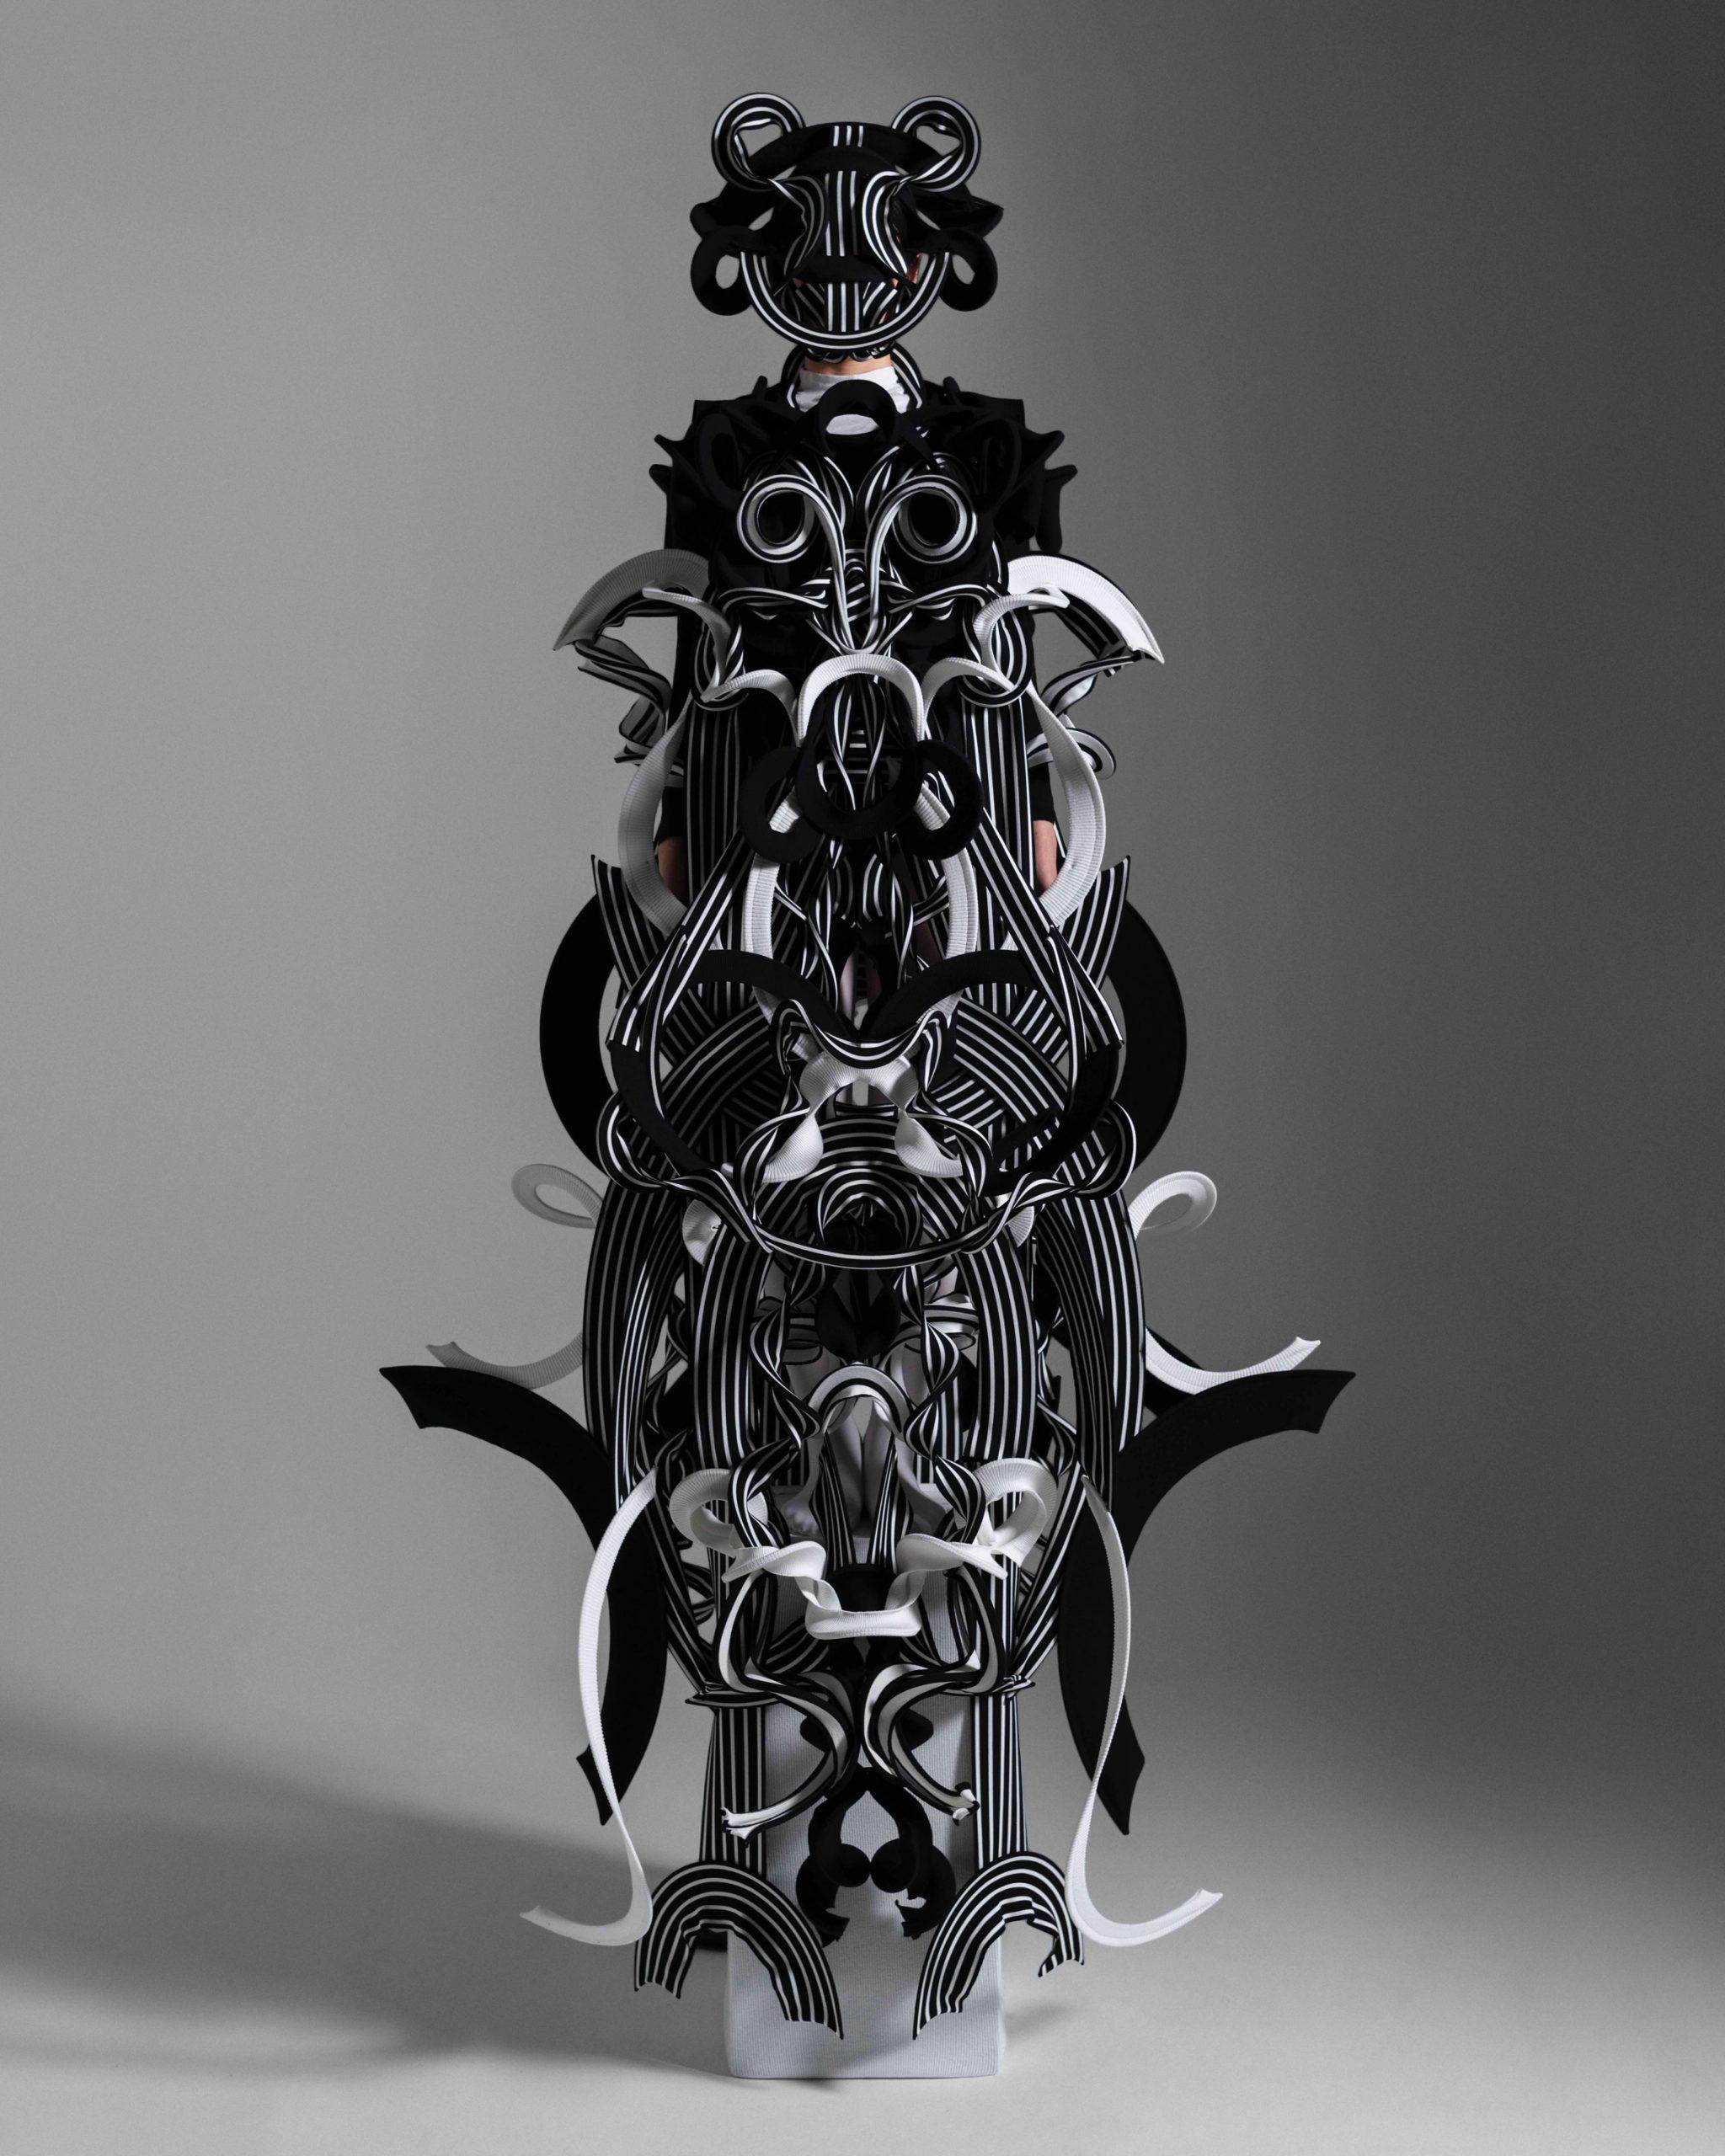 Sculptural materials create geometric couture